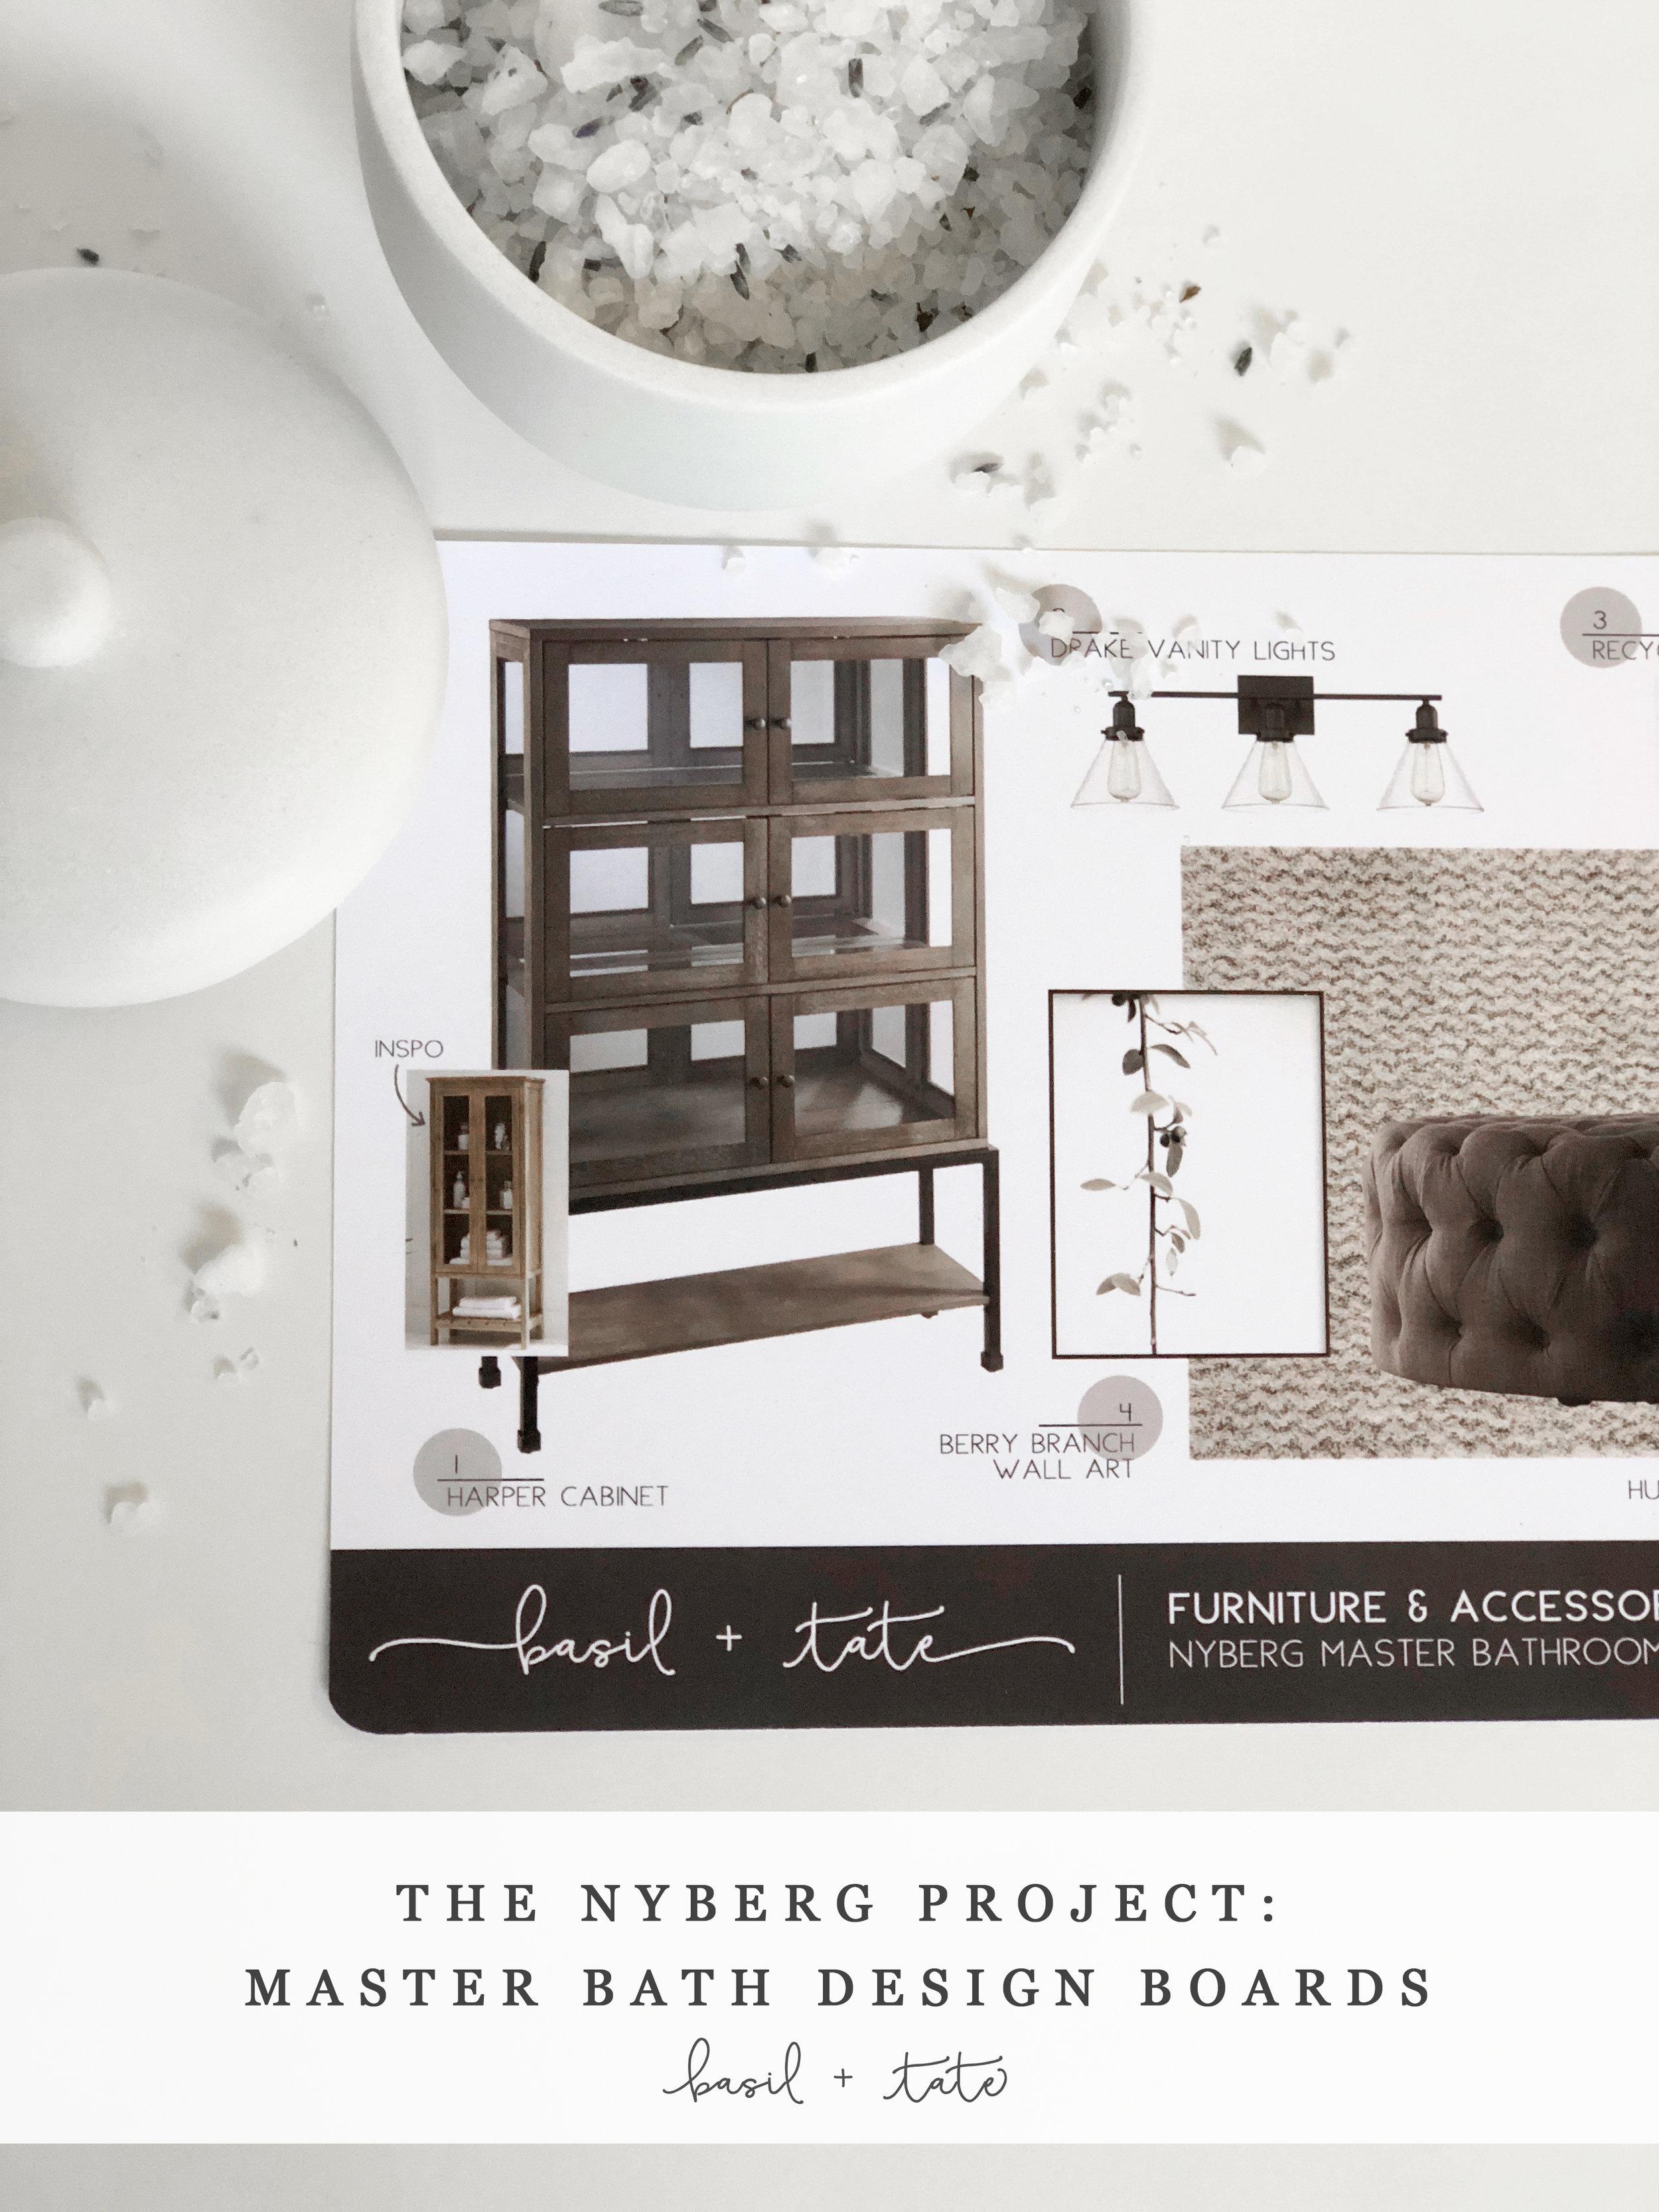 06 - Nyberg Master Bath Design Boards.jpg